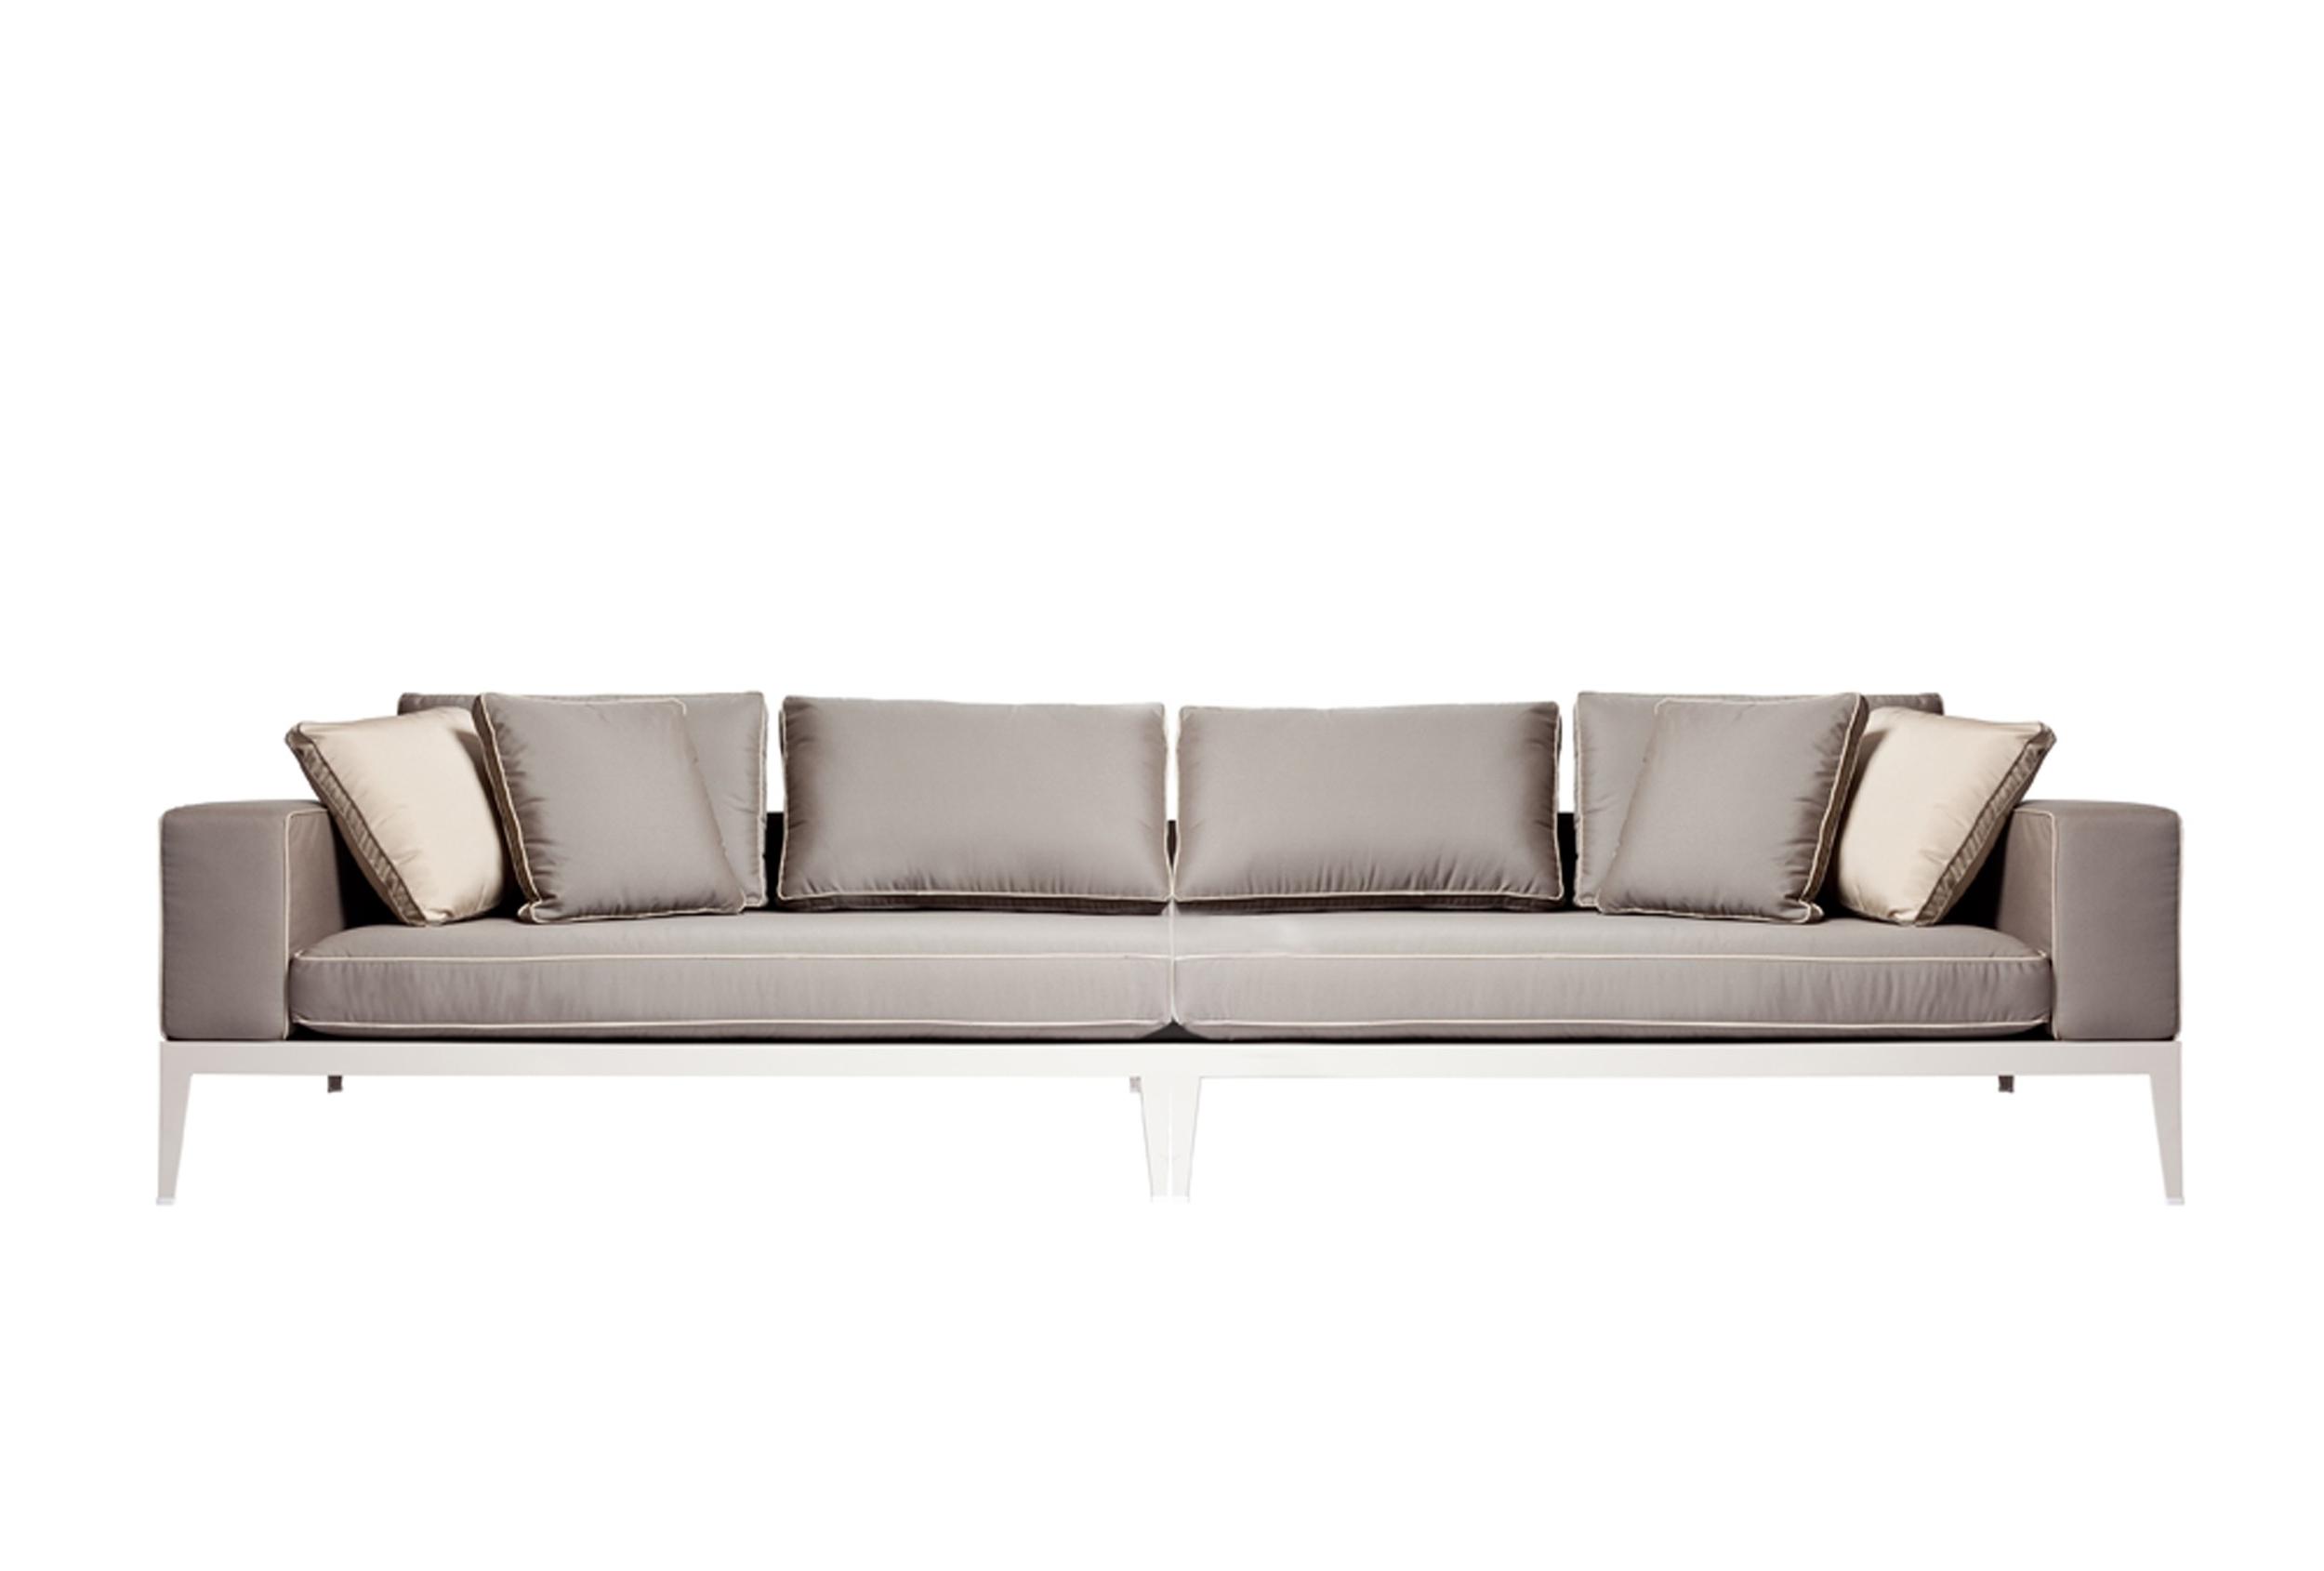 Balmoral 4 Seater Sofa (View 7 of 20)